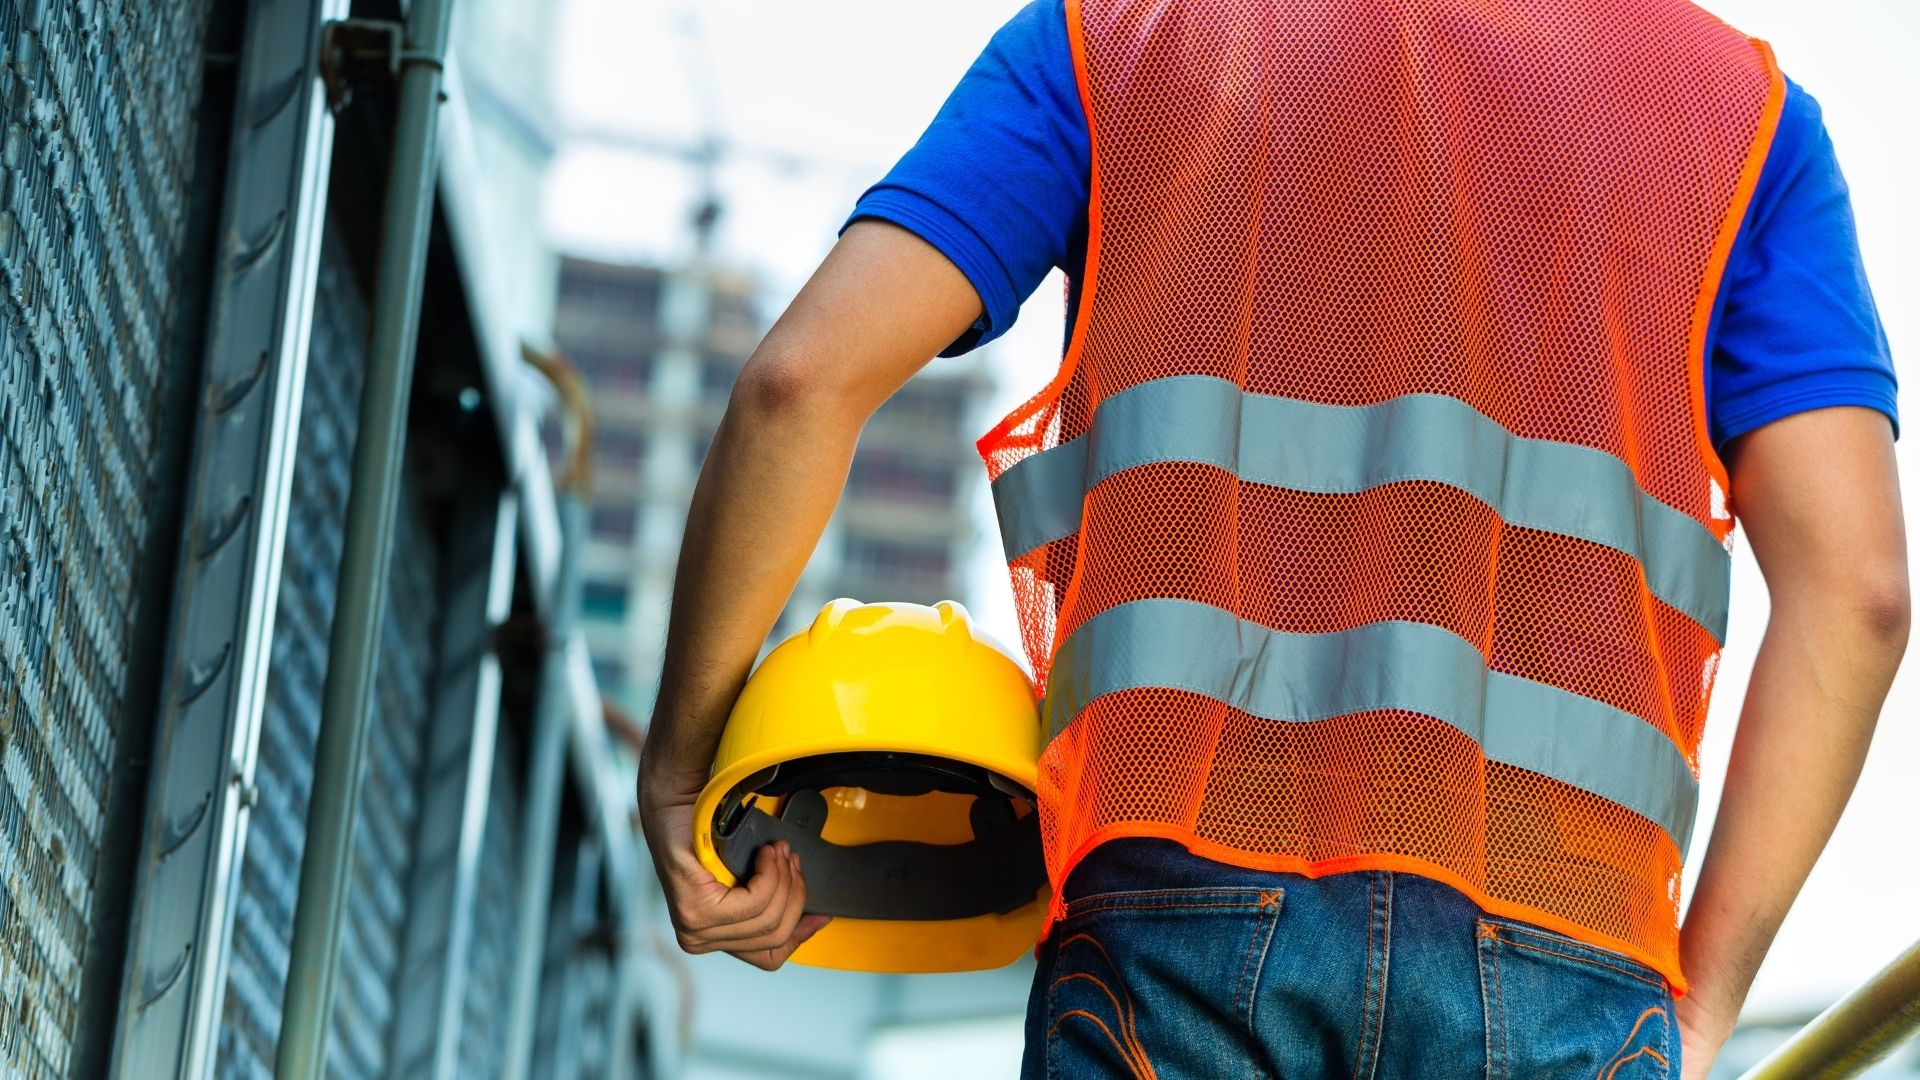 photo illustrating construction jobs